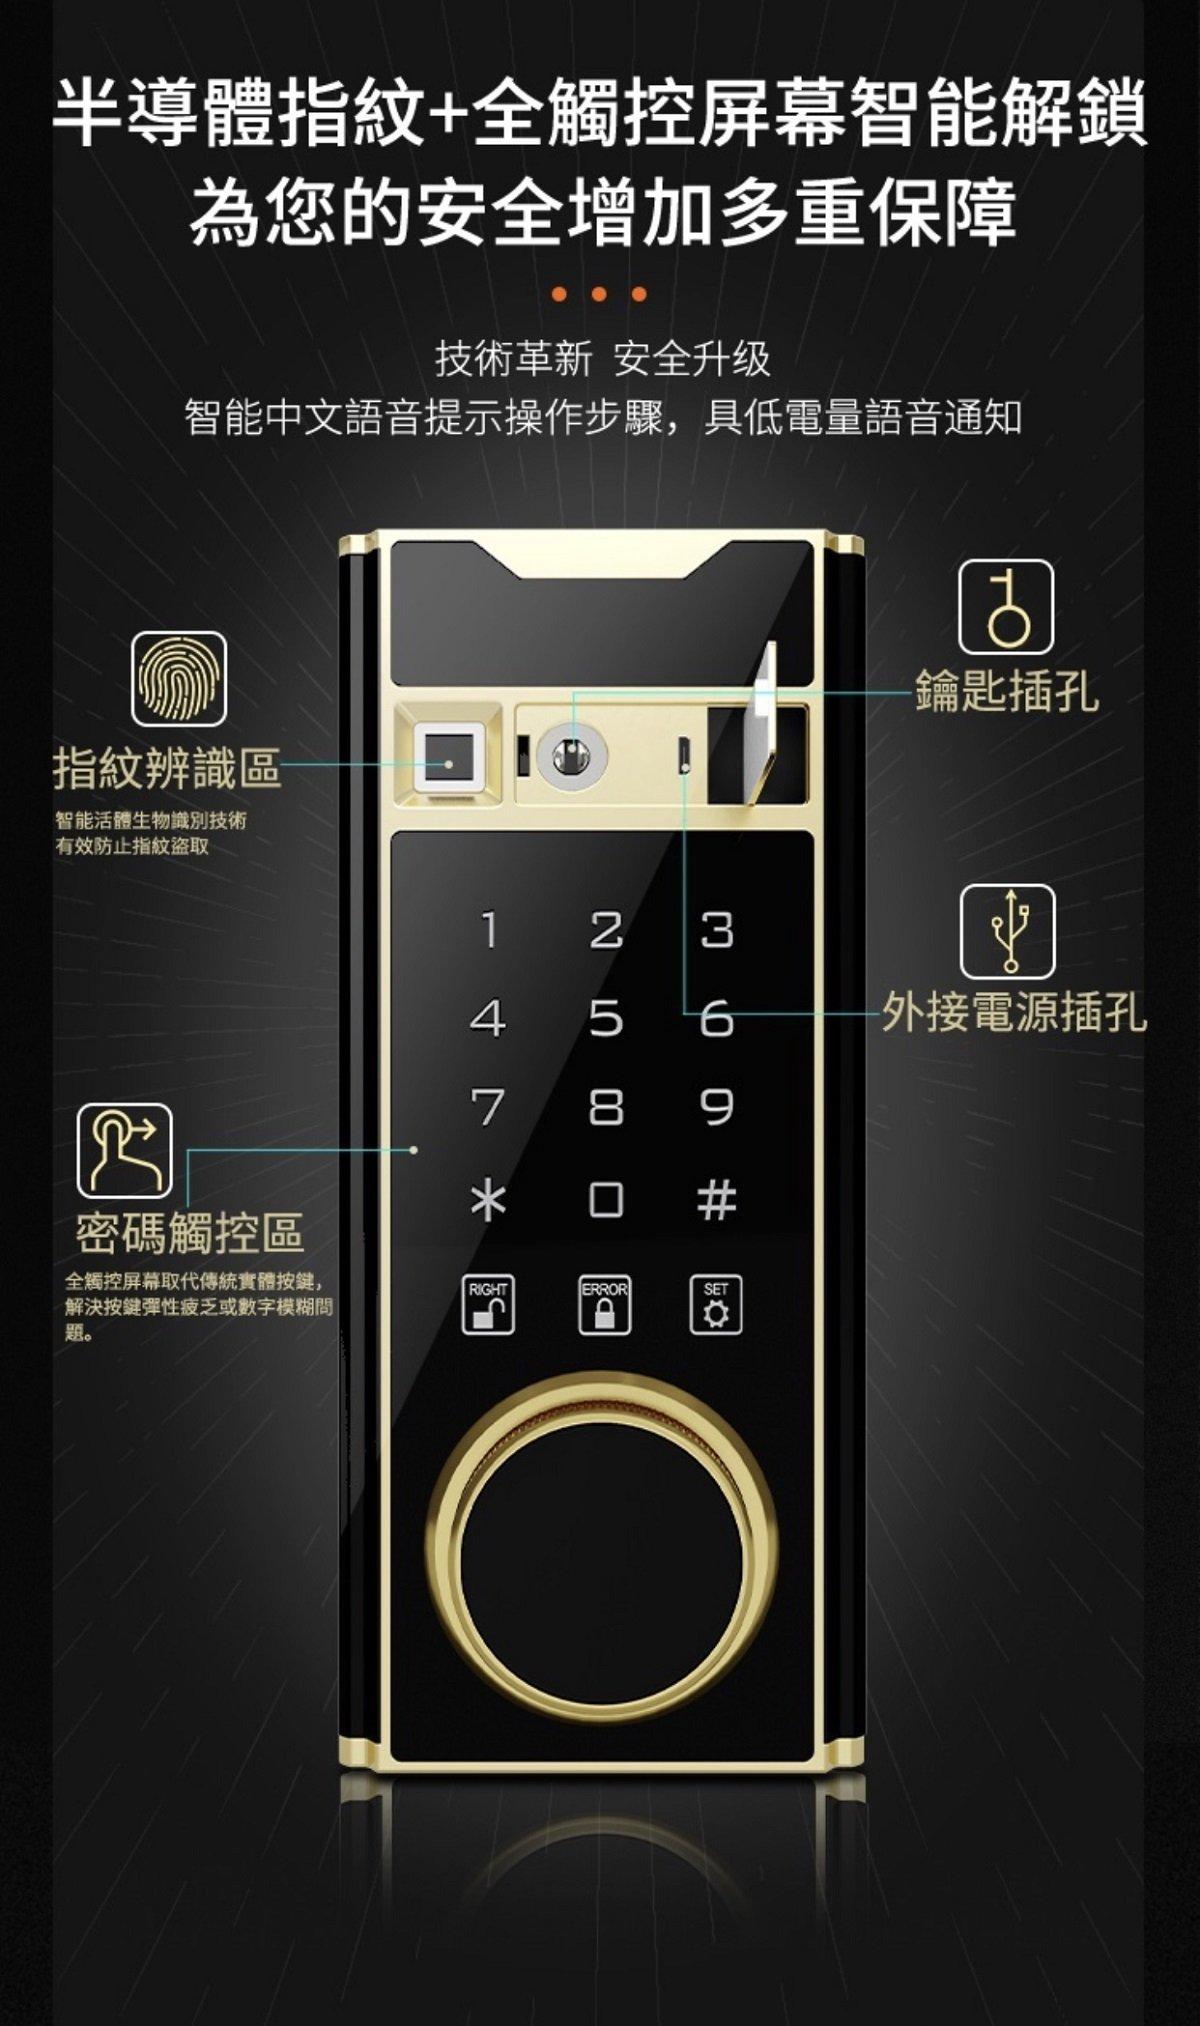 Marketing graphic-PB45-3